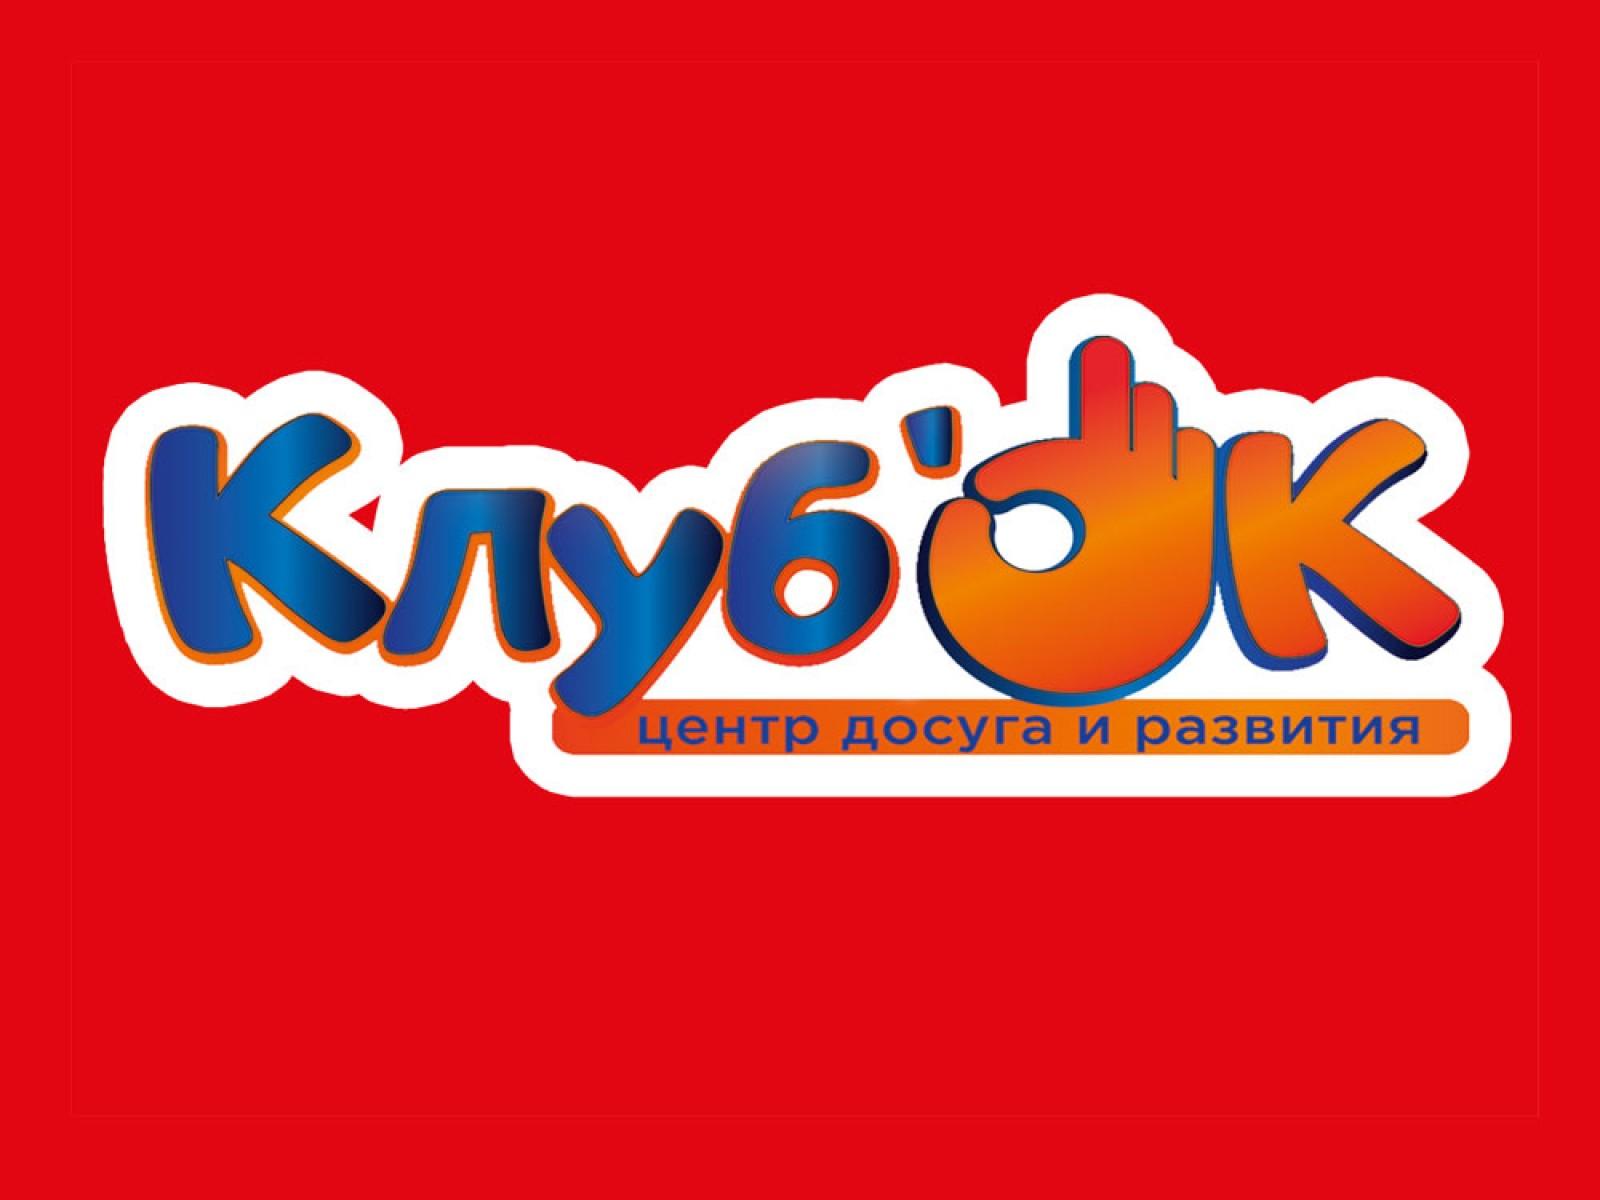 Логотип КлубОК